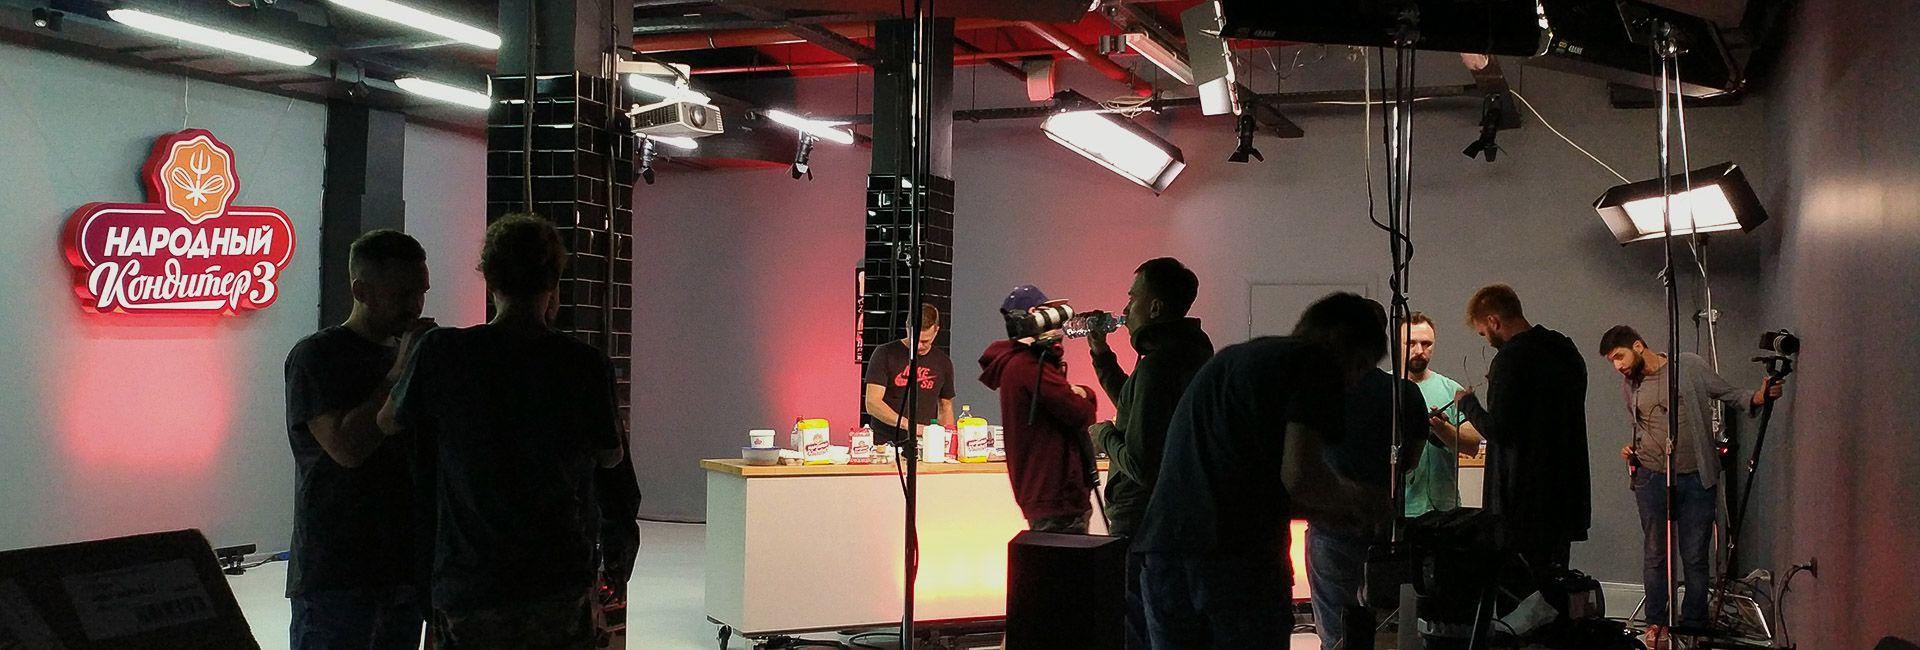 аренда для фото и видеосъемки в кулинарном формате